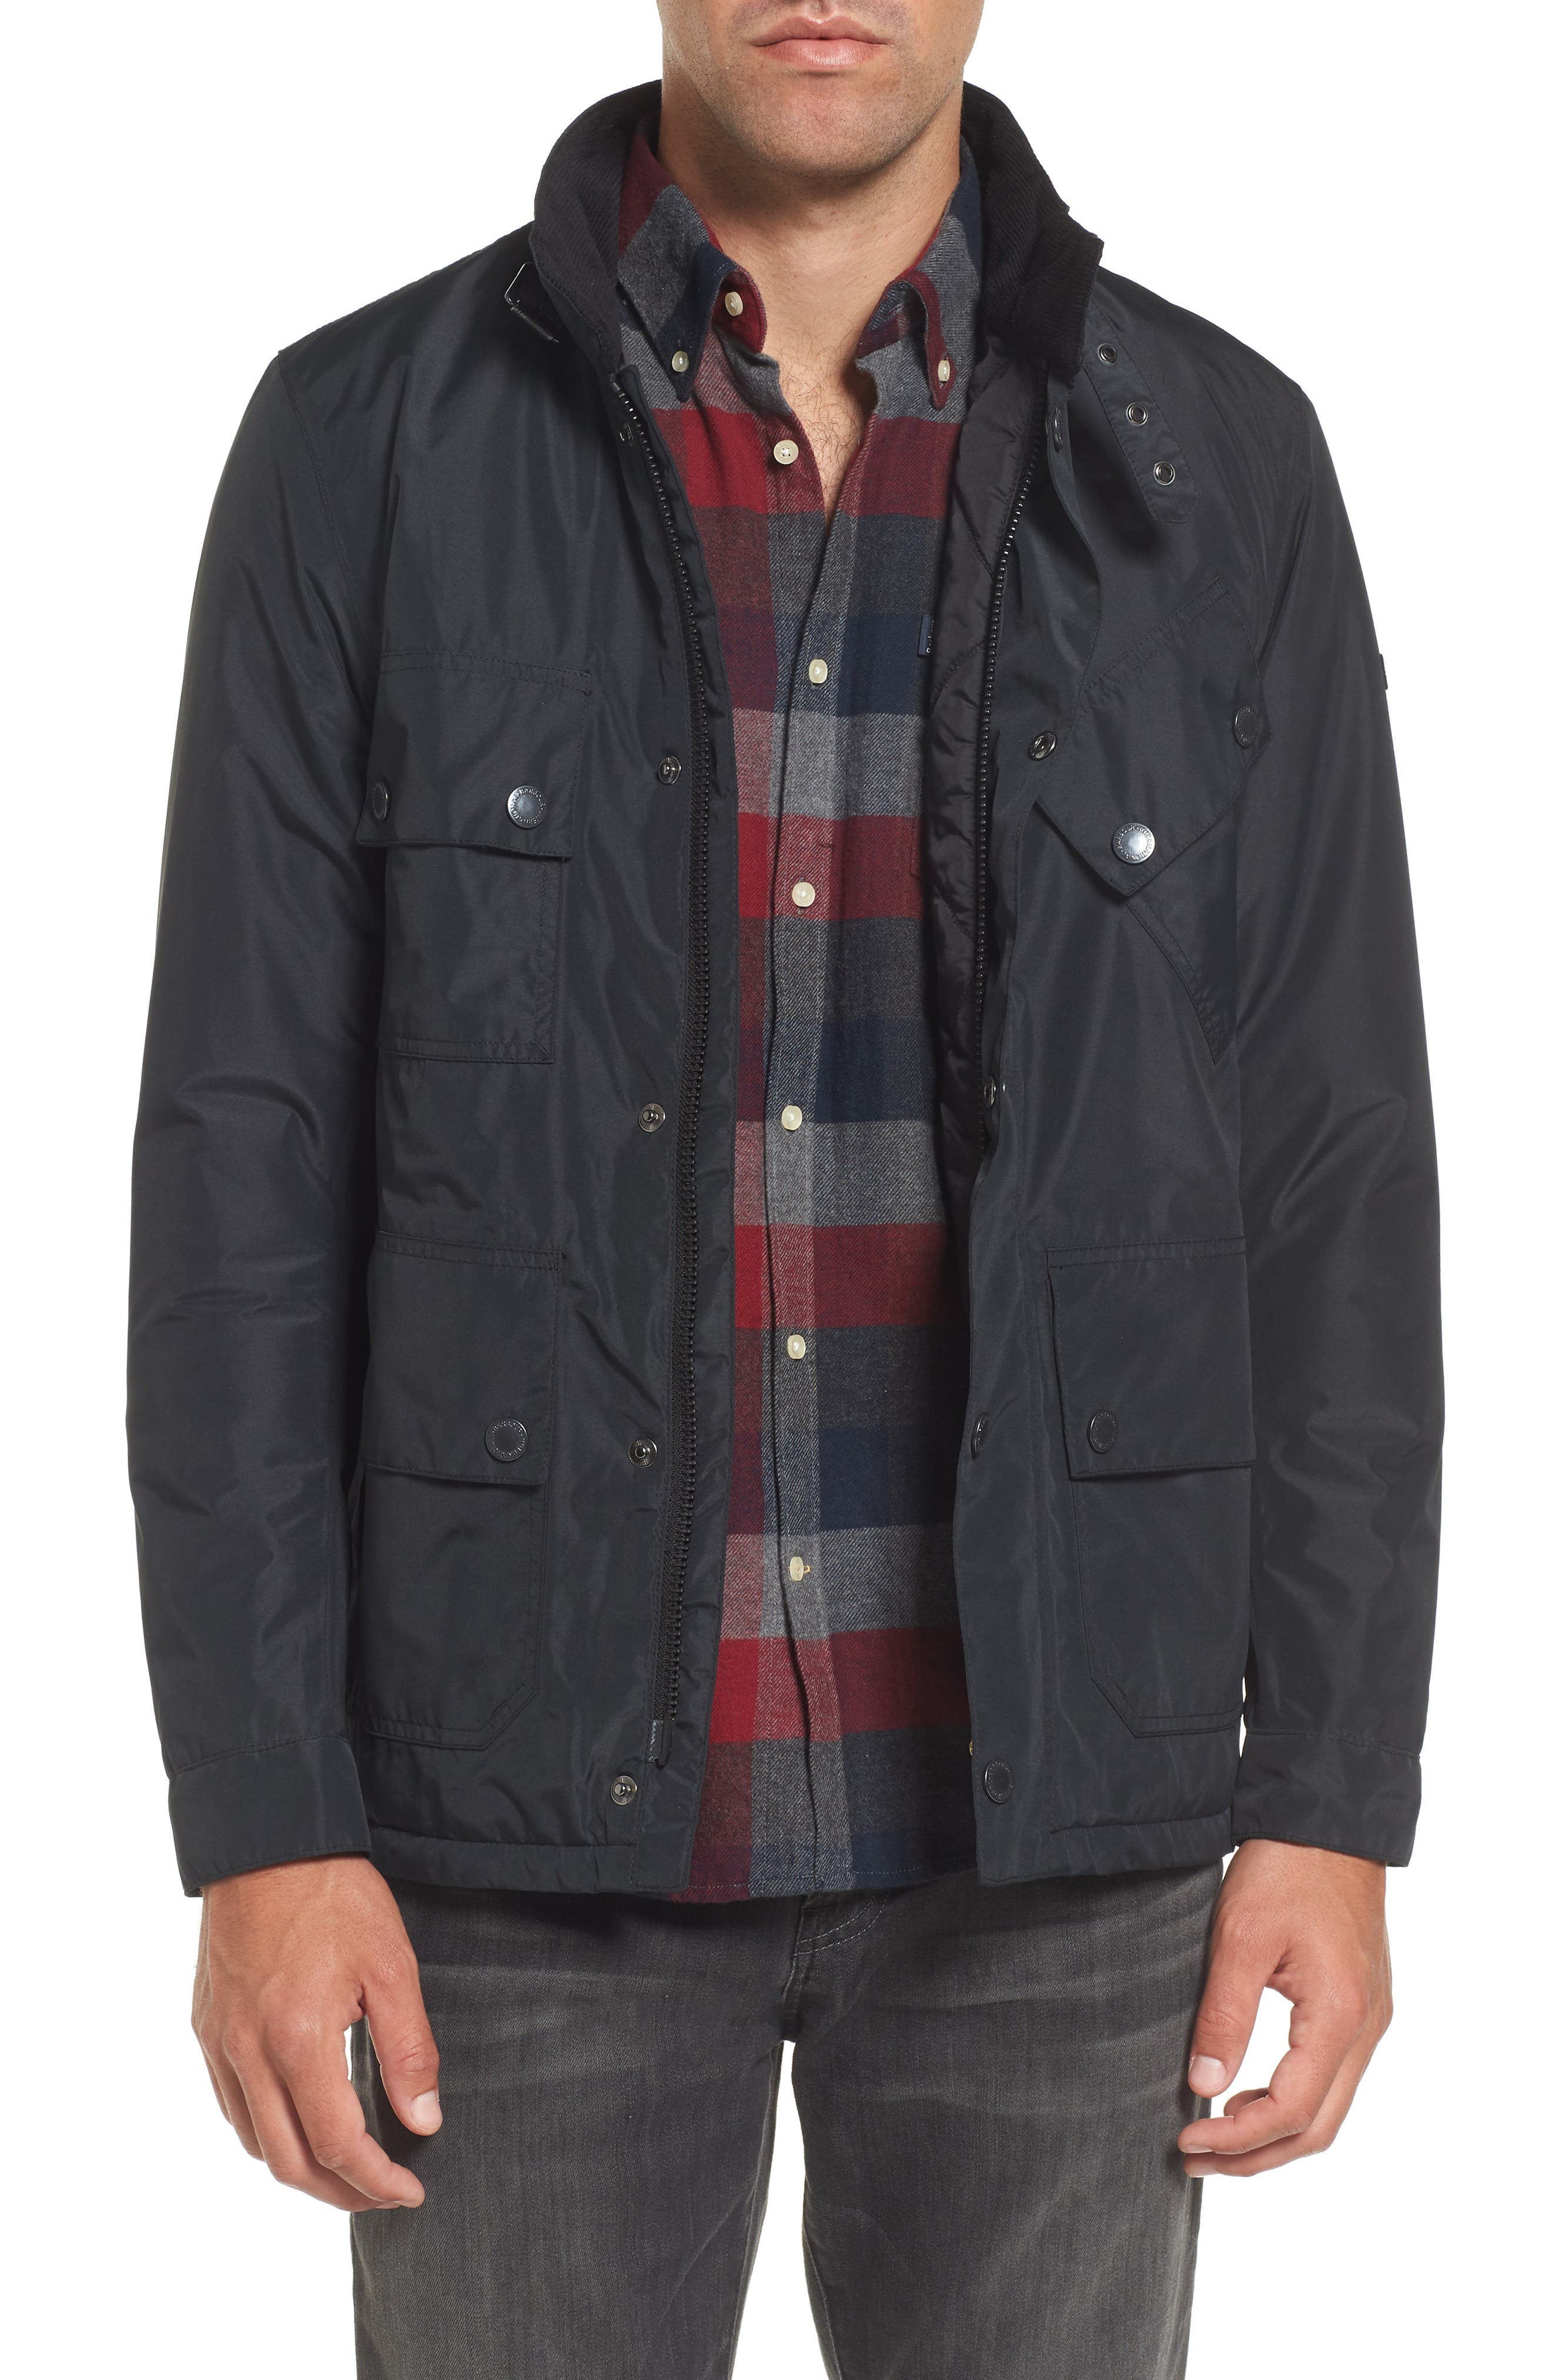 B.Intl Tyne Waterproof Jacket,                             Main thumbnail 1, color,                             001